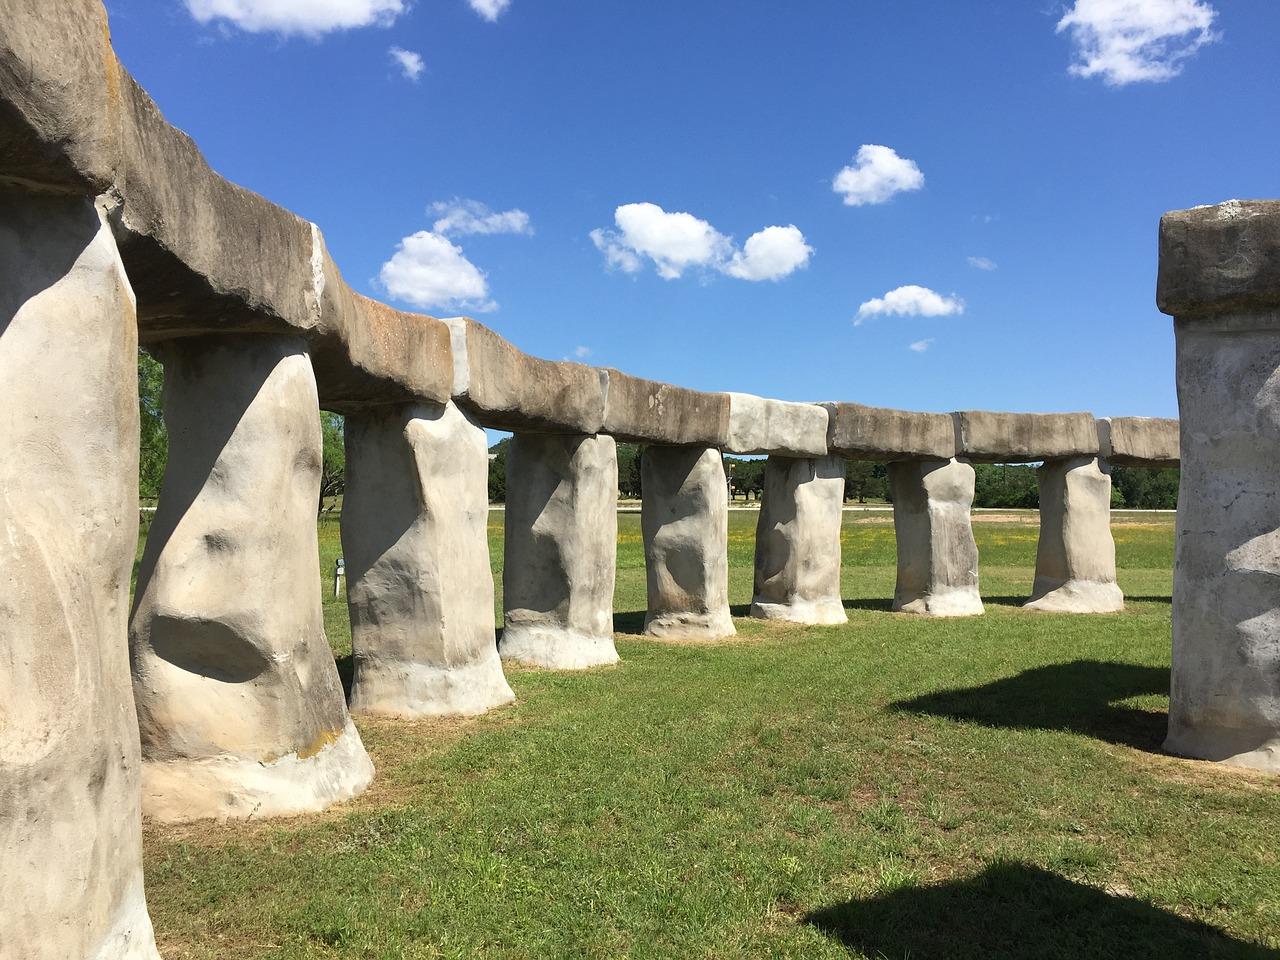 stone-structure-2436746_1280